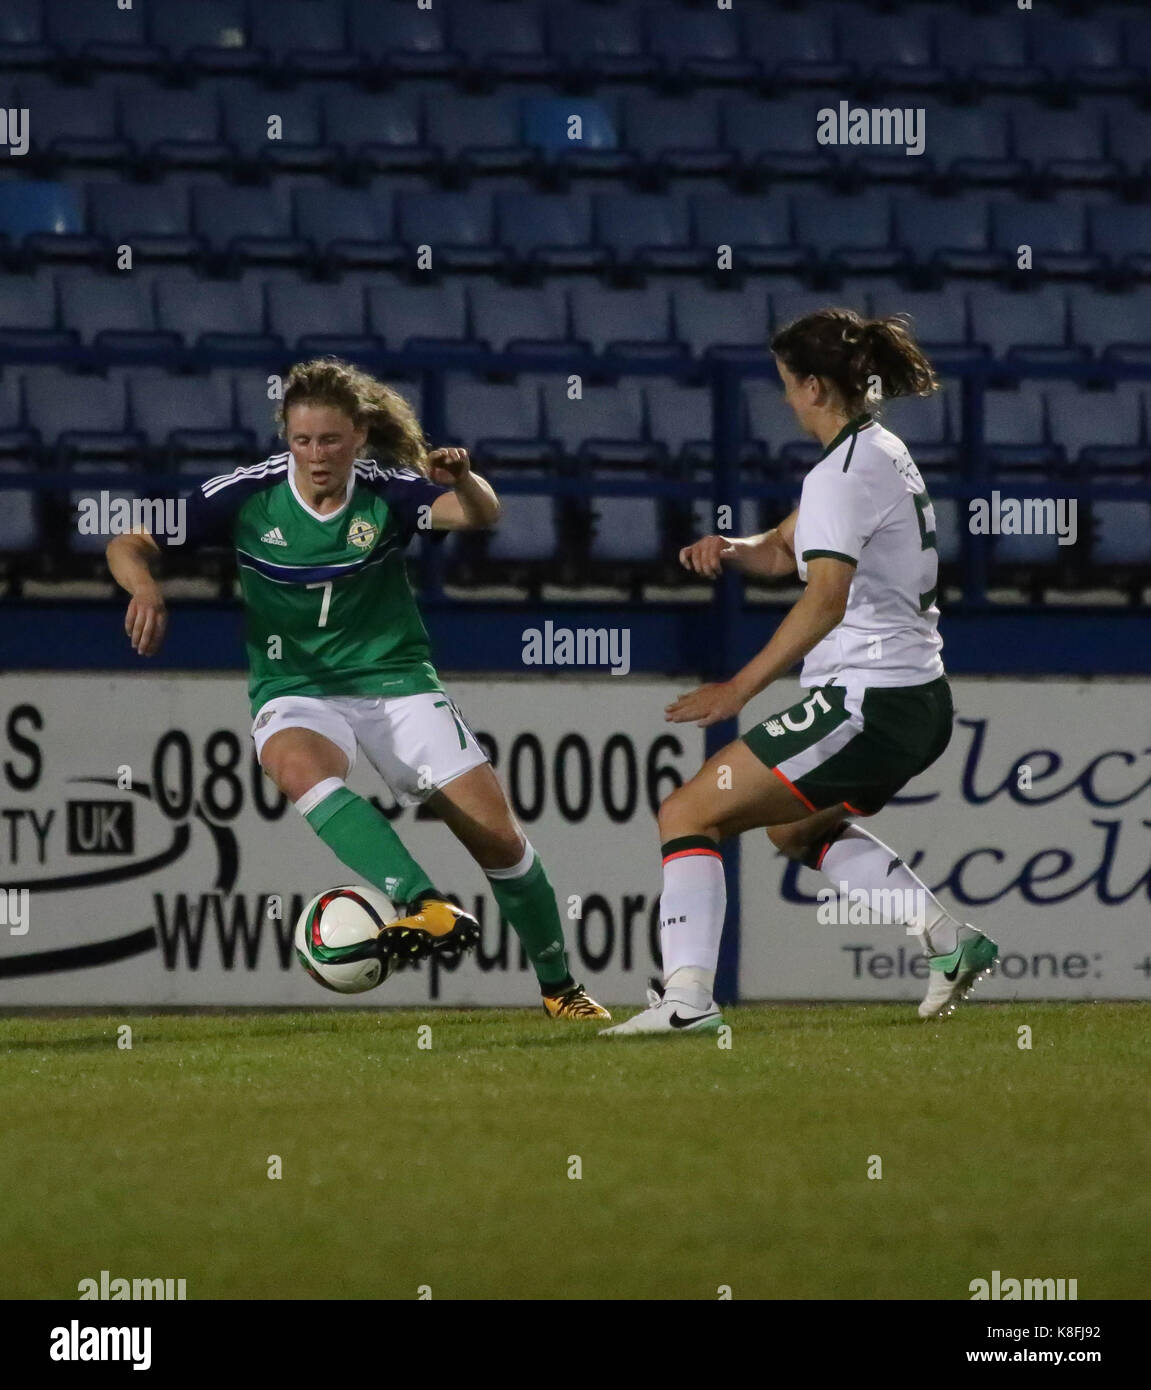 Lurgan, Northern, Ireland. 19th Sep, 2017. 2019 FIFA Women's World Cup Qualifier (Group 3). Northern Ireland v Republic Stock Photo